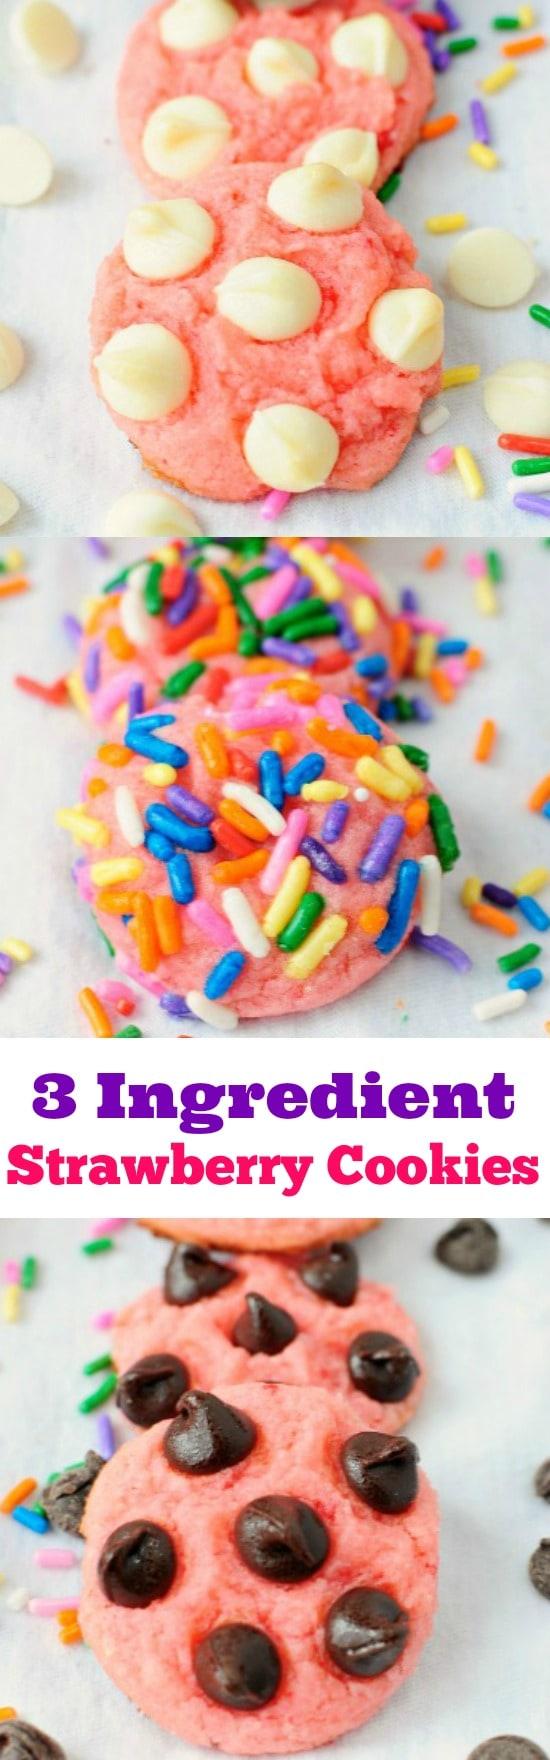 3 Ingredient Strawberry Cookies